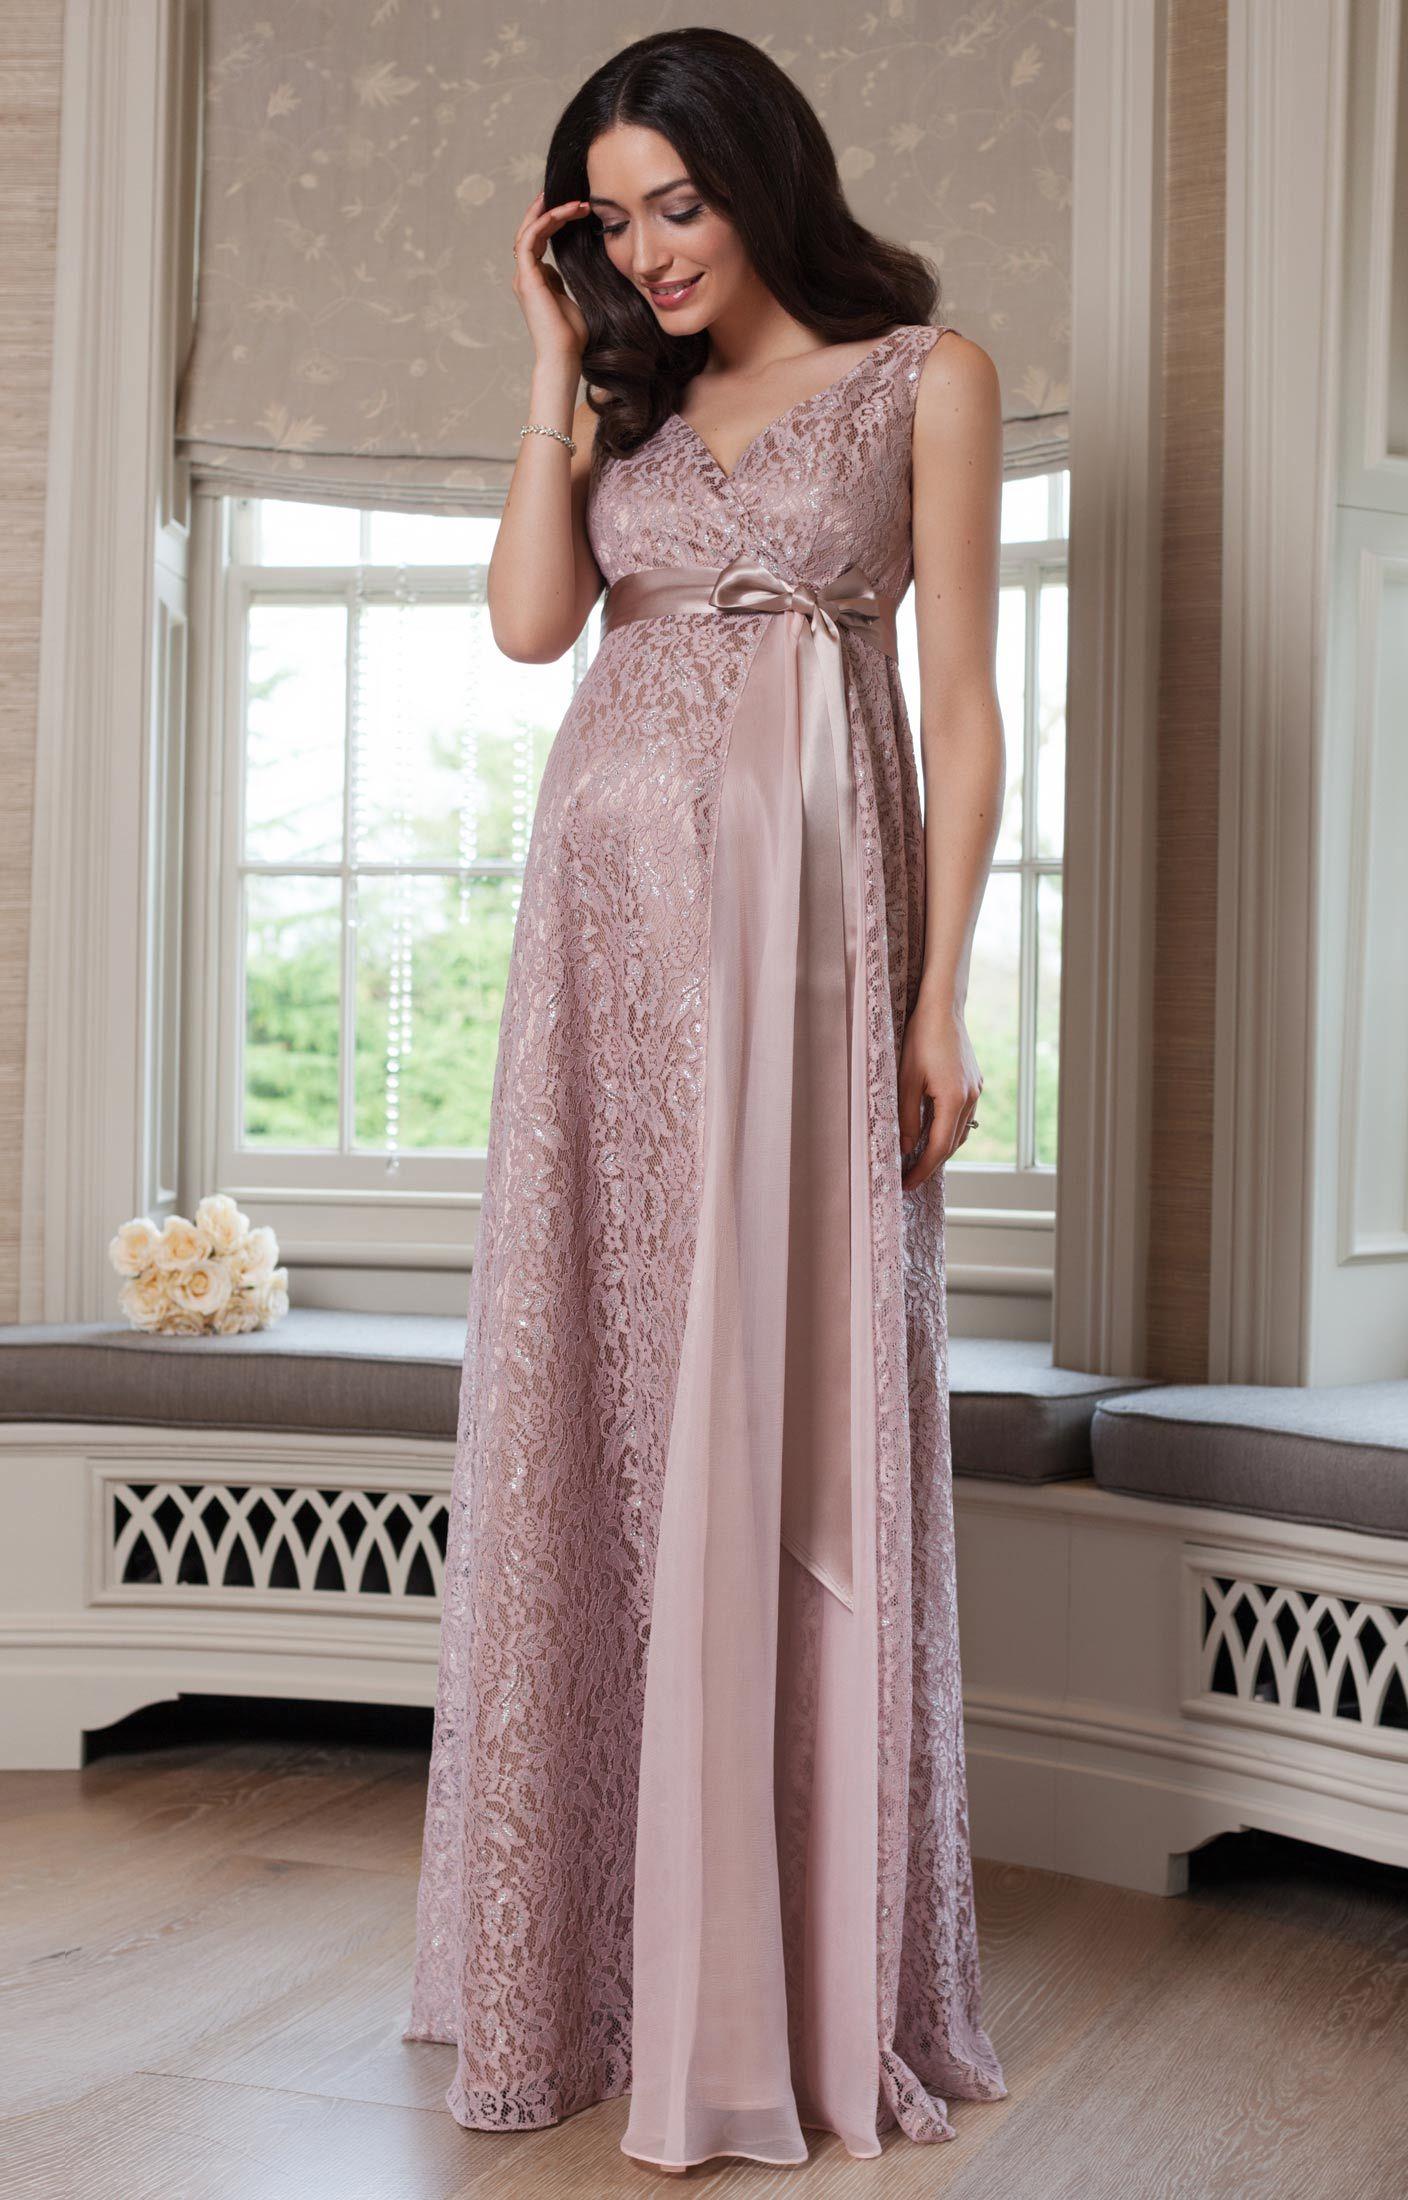 Thea Maternity Gown Long Blush - Maternity Wedding Dresses